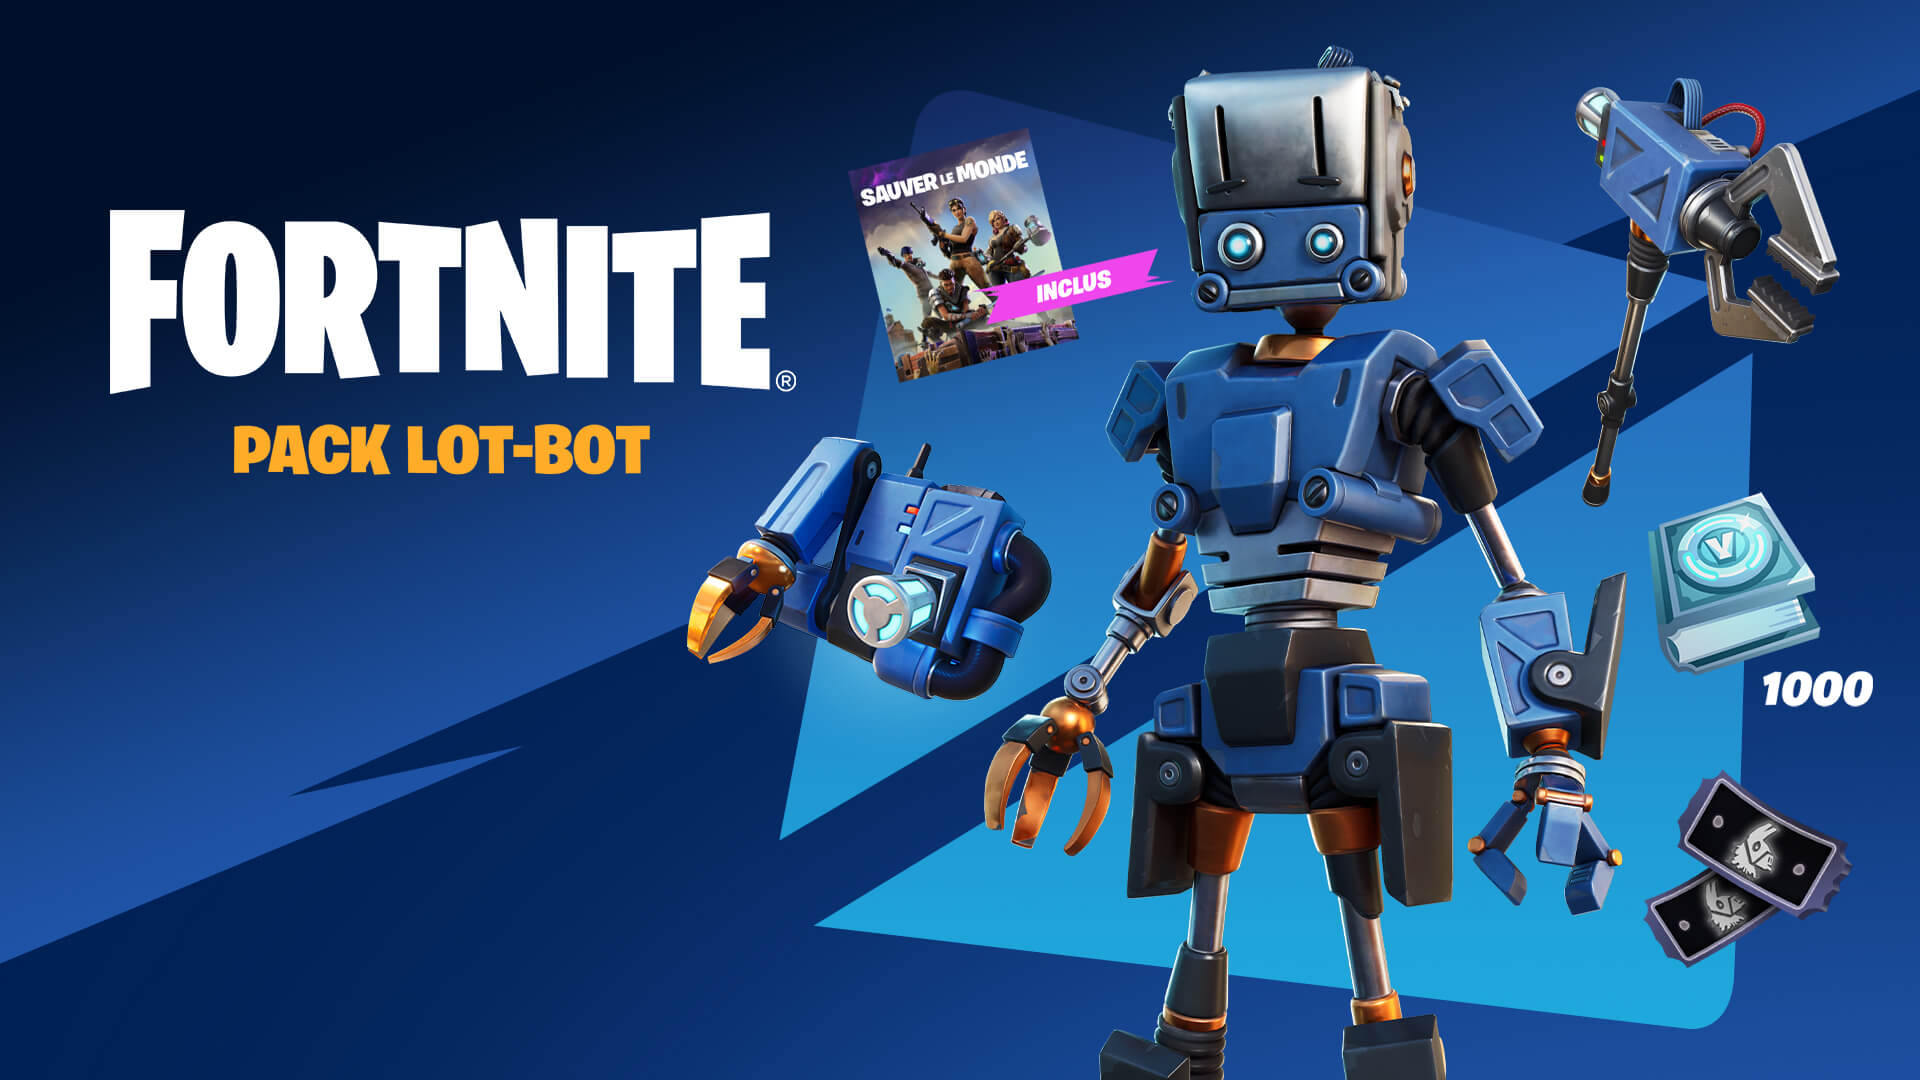 Fr Fortnite Save The World Lok Bot Pack